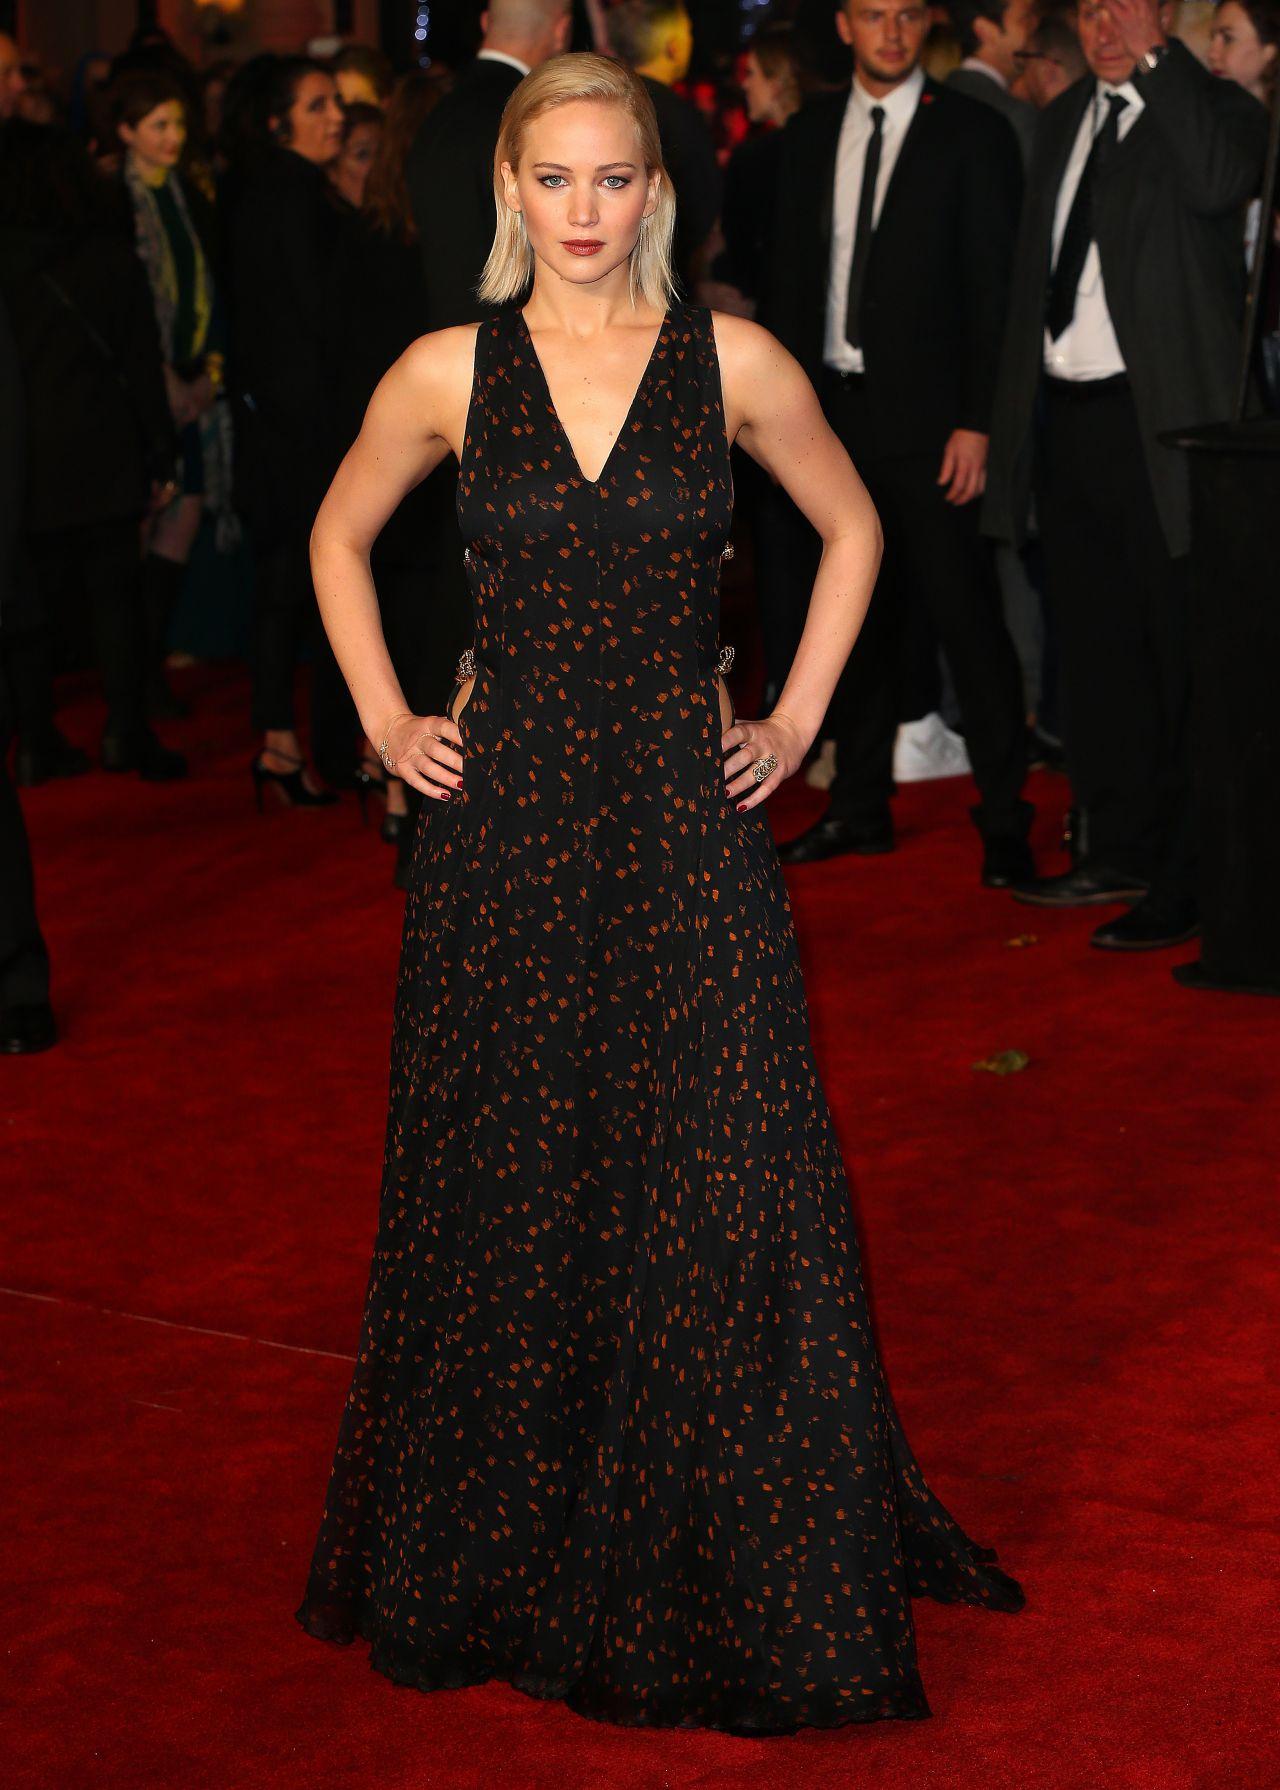 Jennifer Lawrence On Red Carpet The Hunger Games